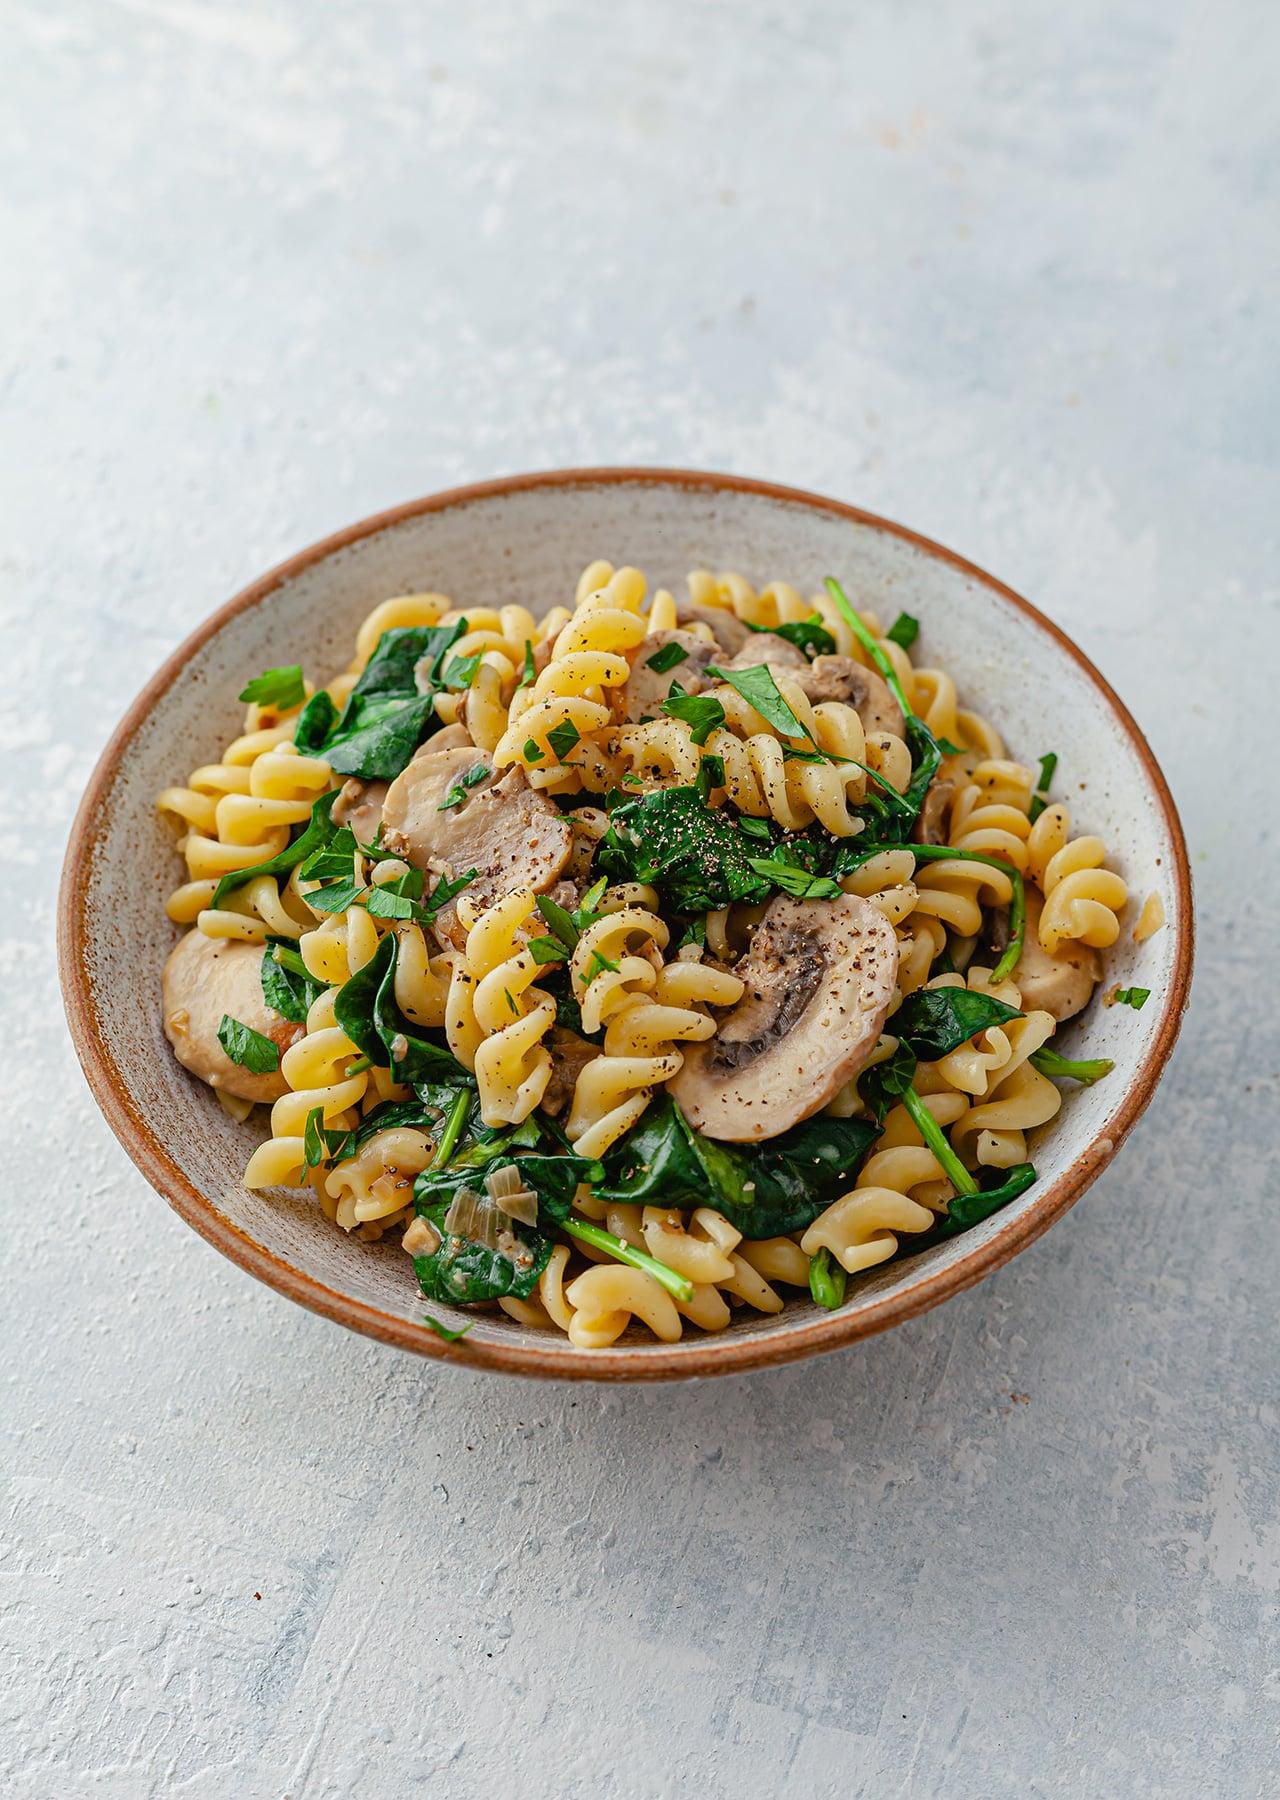 Vegan One Pot Mushroom Spinach Pasta Recipe